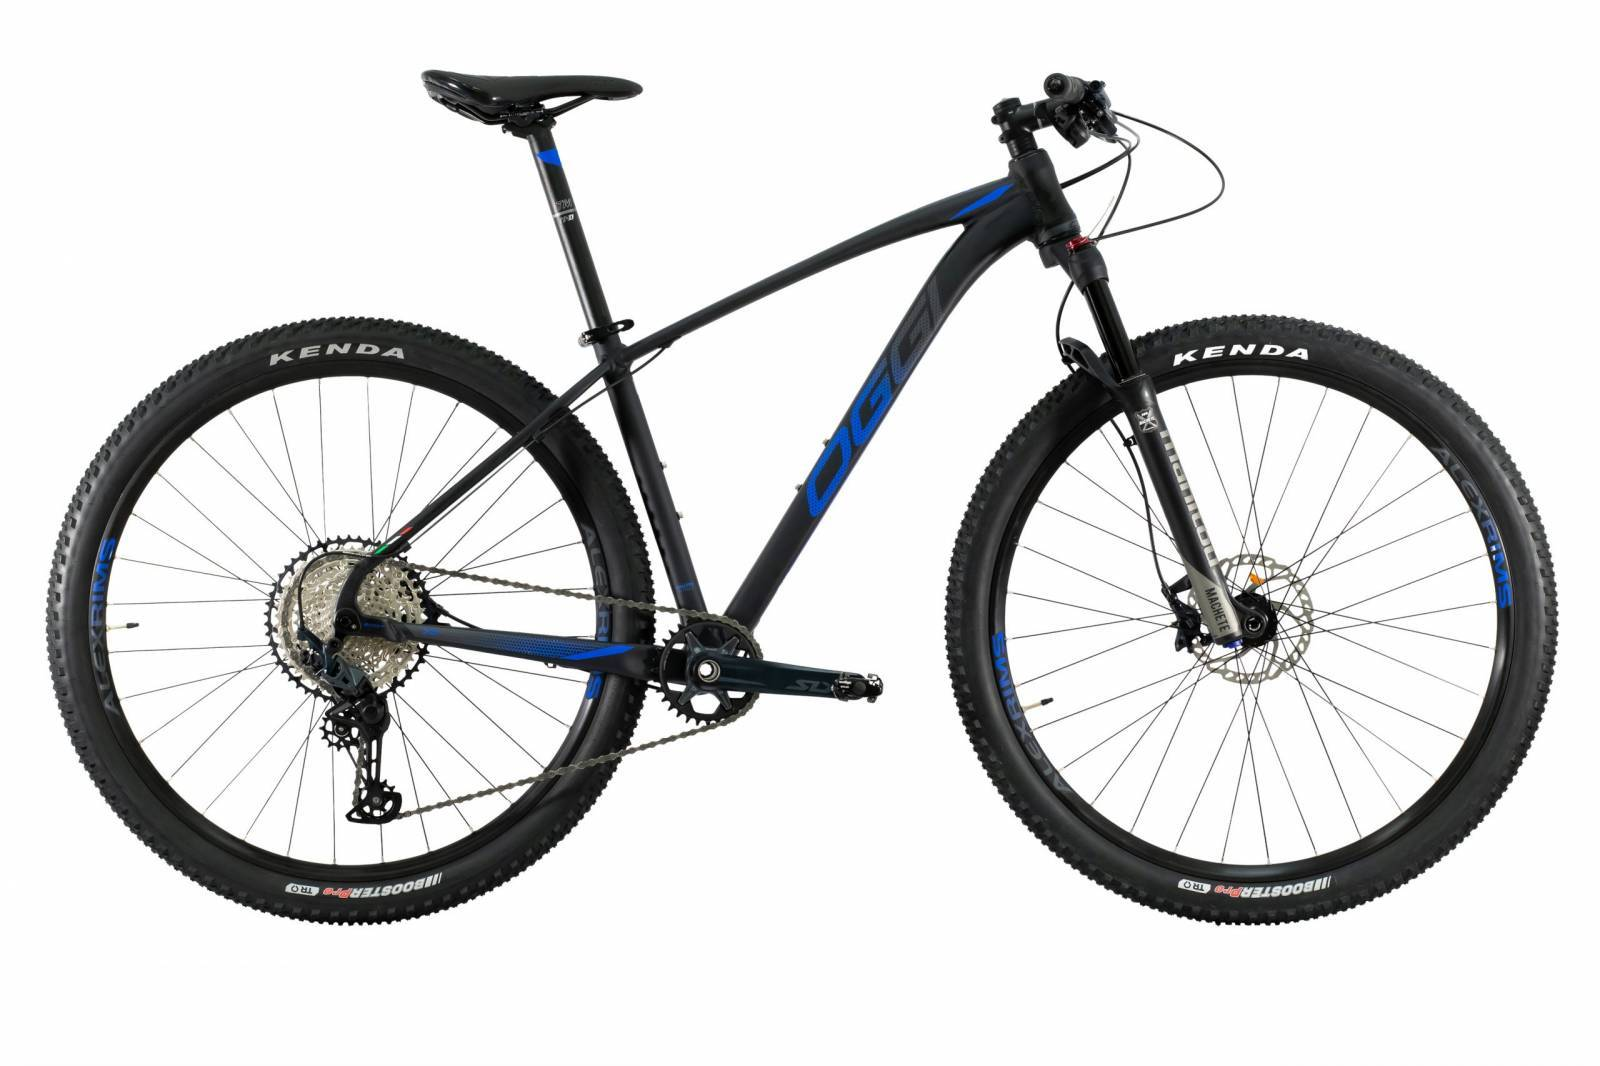 BICICLETA OGGI BIG WHEEL 7.4 SLX 12V 2021 - Cicles Jahn